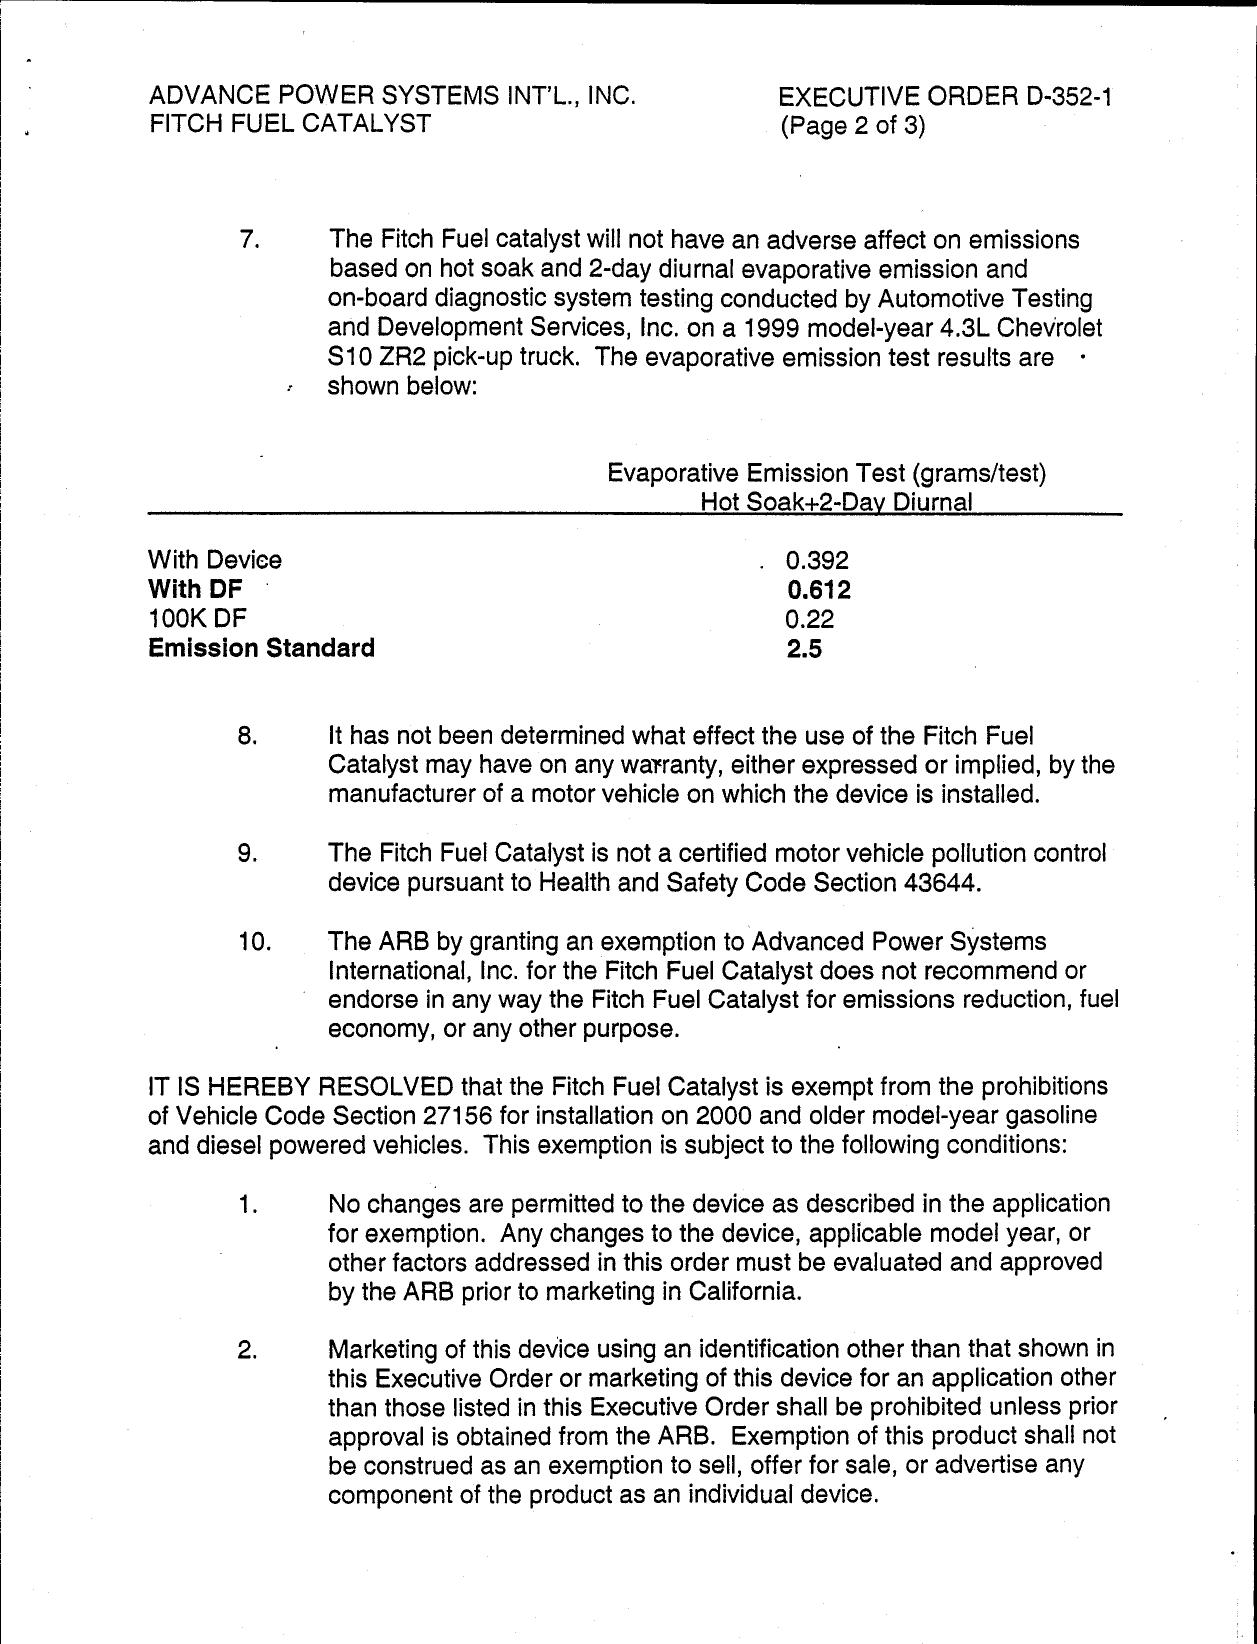 Executive Order D 352 1 Advanced Power Systems International Inc